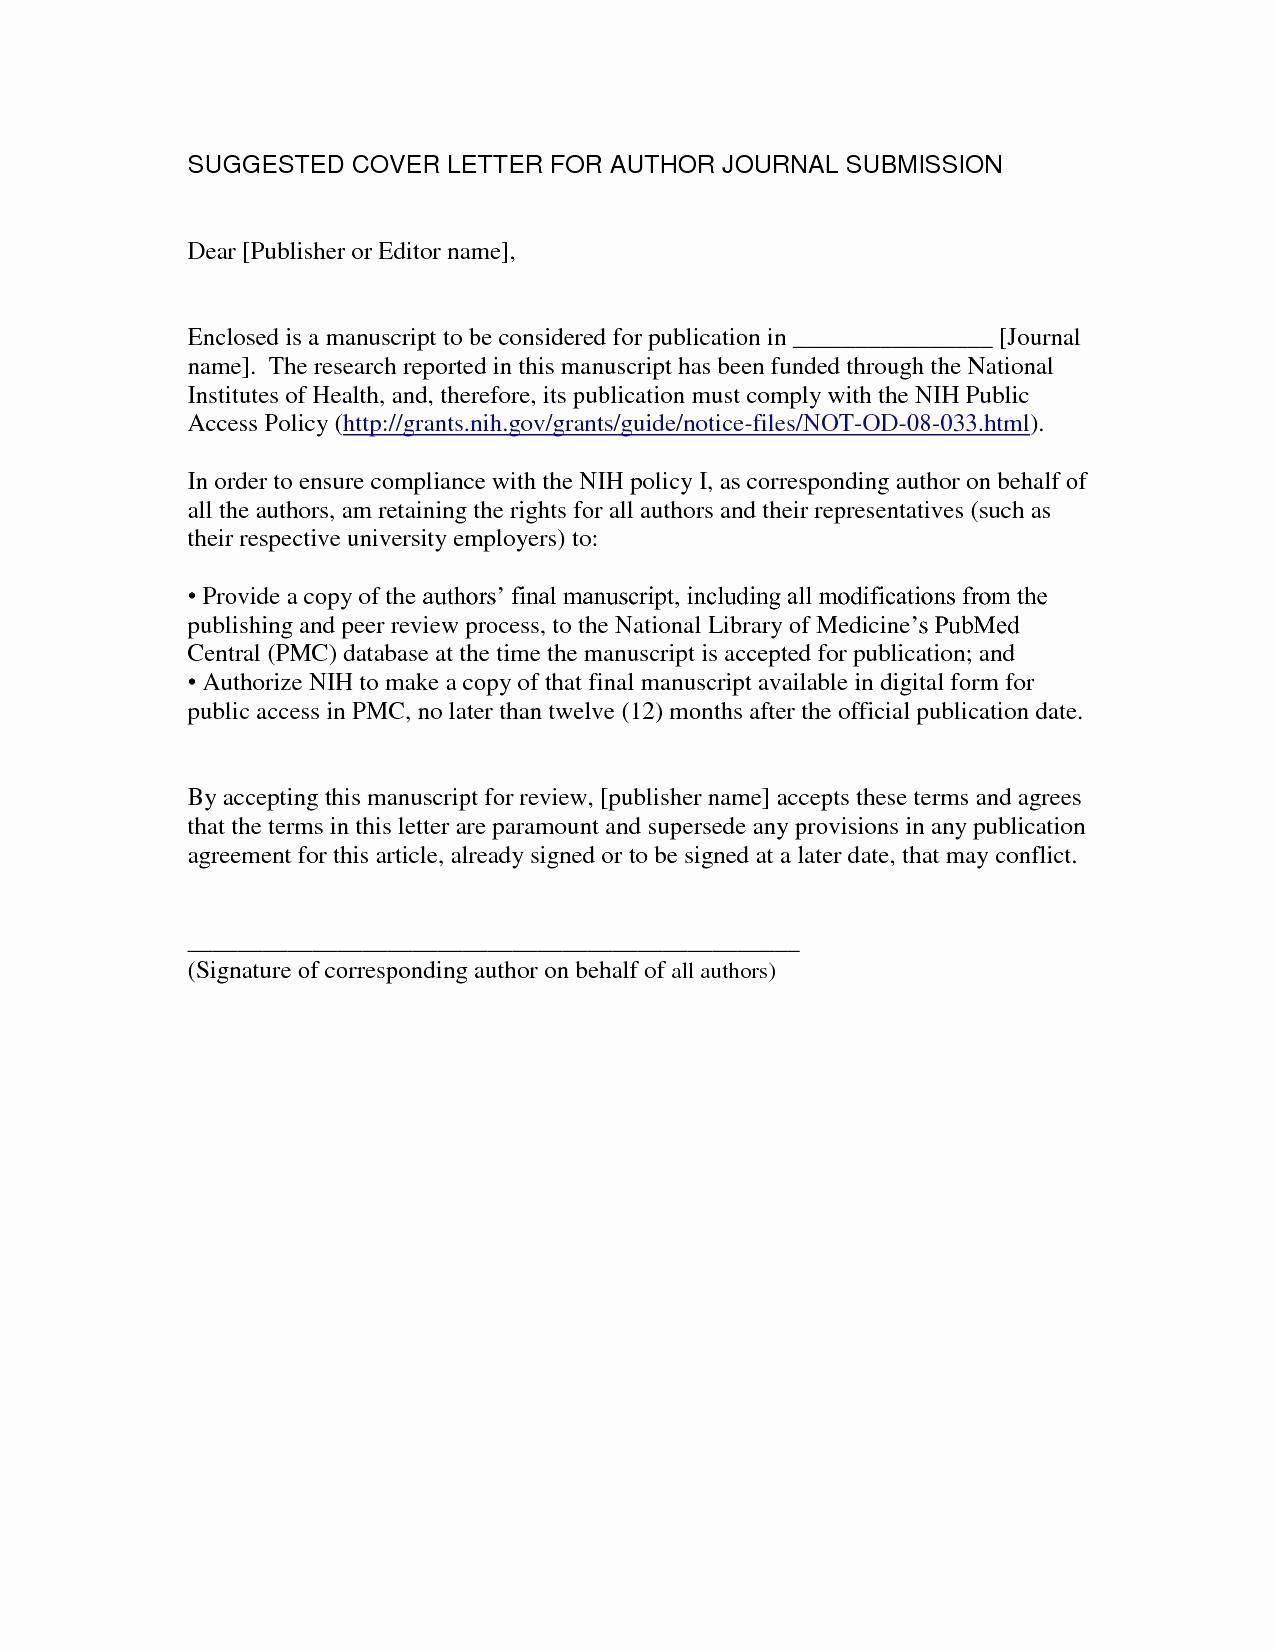 Lottery Pool Agreement Template Templates Mtu1nzu